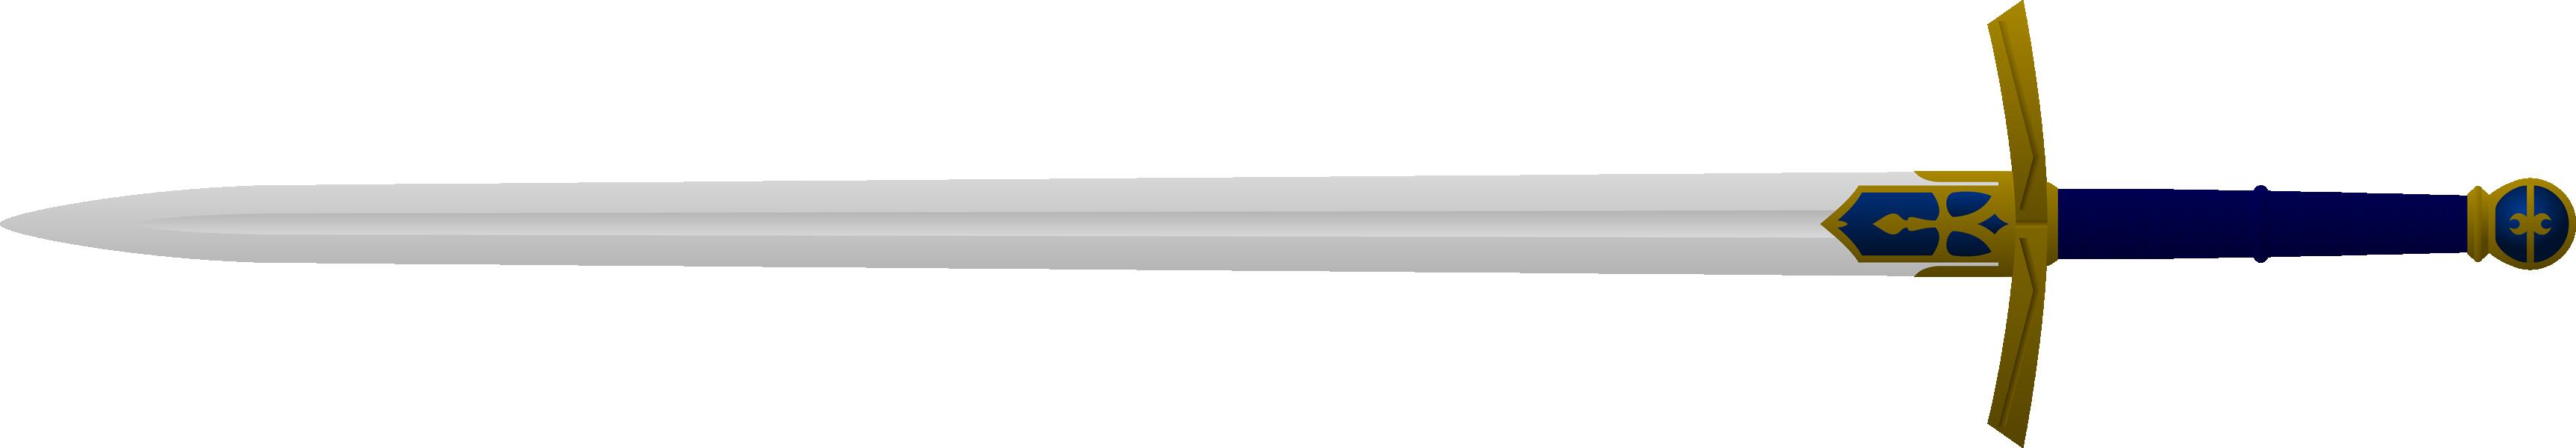 Swords png free download. Clipart sword transparent background